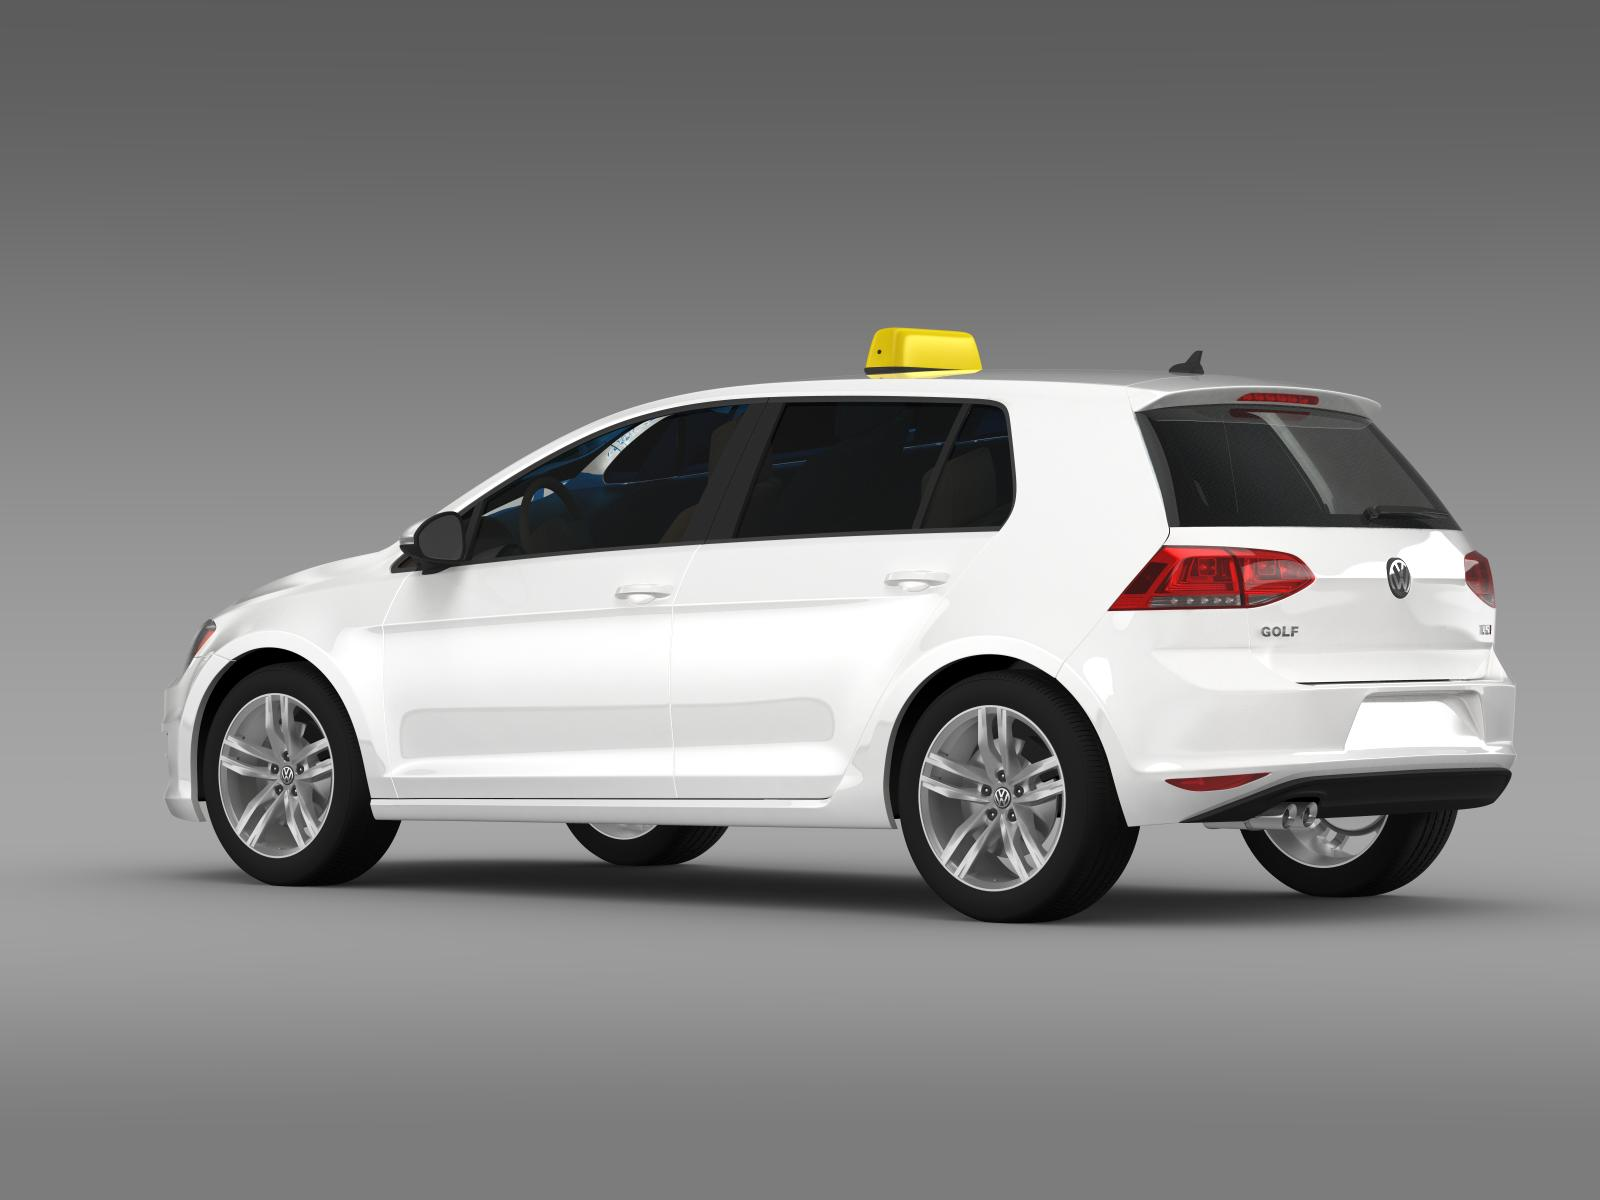 volkswagen golf tsi taxi 3d model buy volkswagen golf. Black Bedroom Furniture Sets. Home Design Ideas